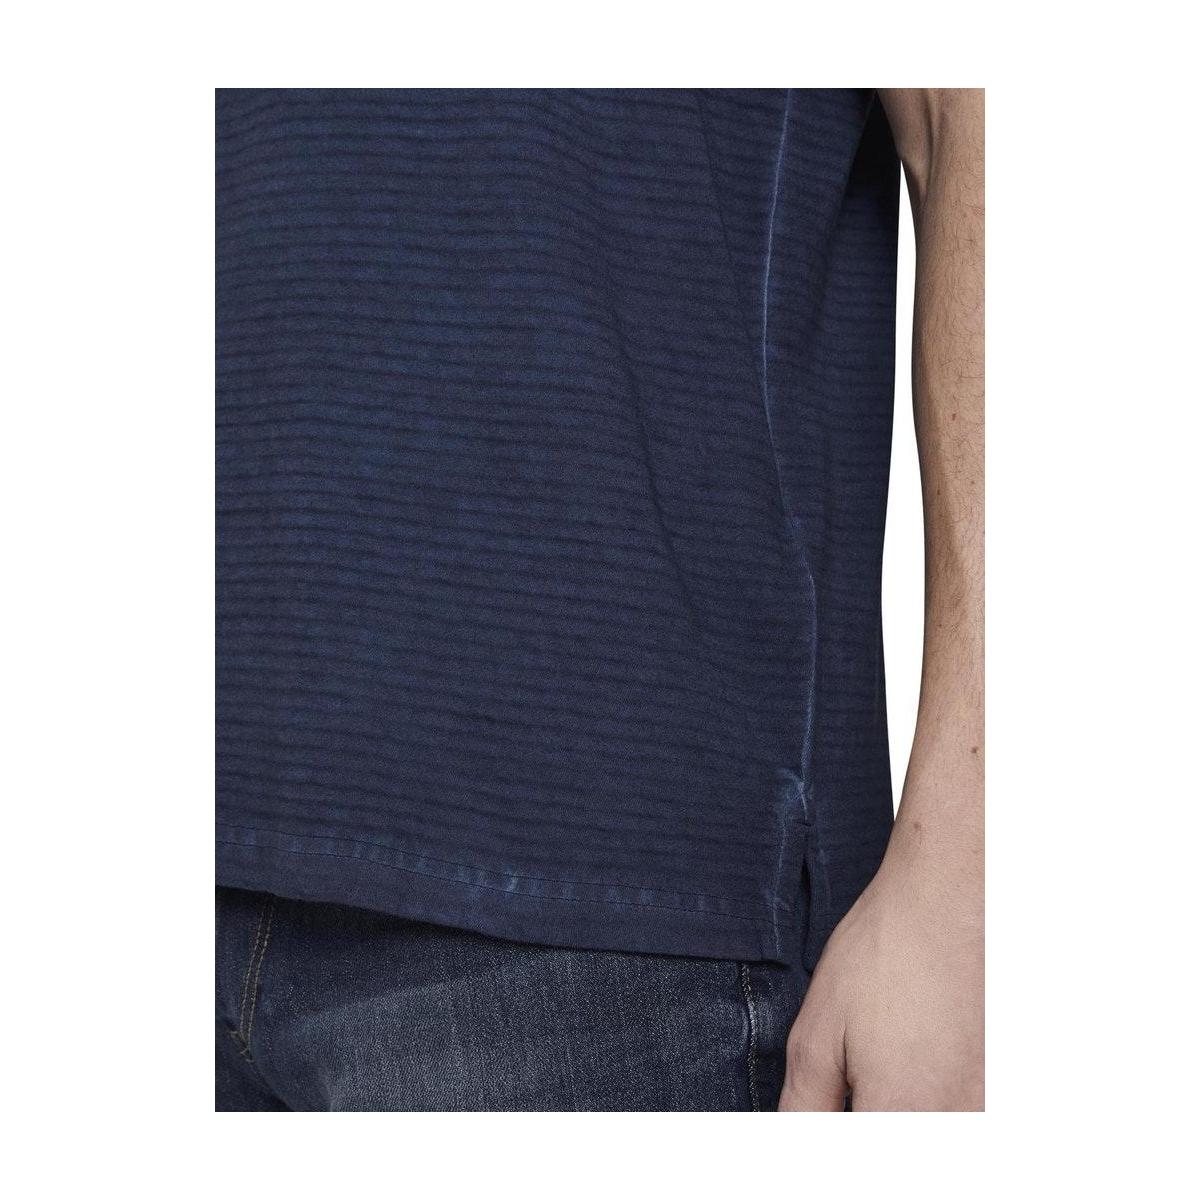 gestreept poloshirt met borduursel 1018856xx10 tom tailor polo 10334